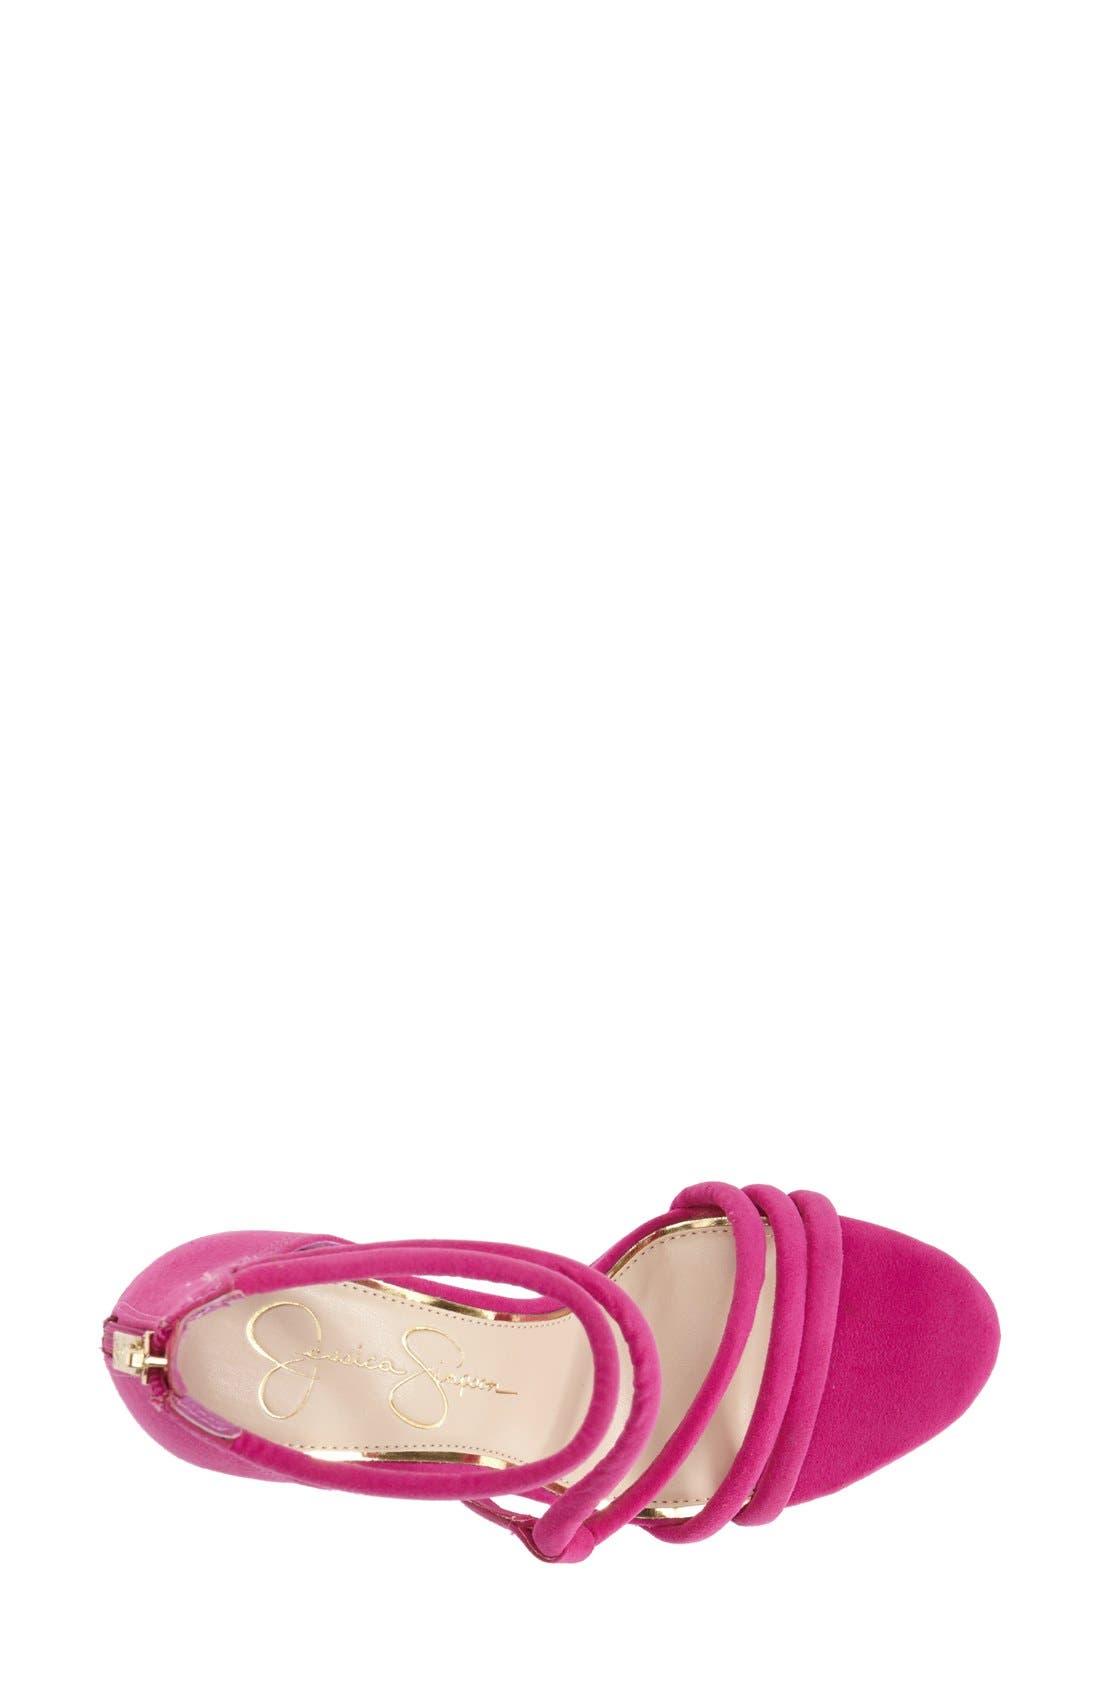 Alternate Image 3  - Jessica Simpson 'Caela' Platform Sandal (Women)